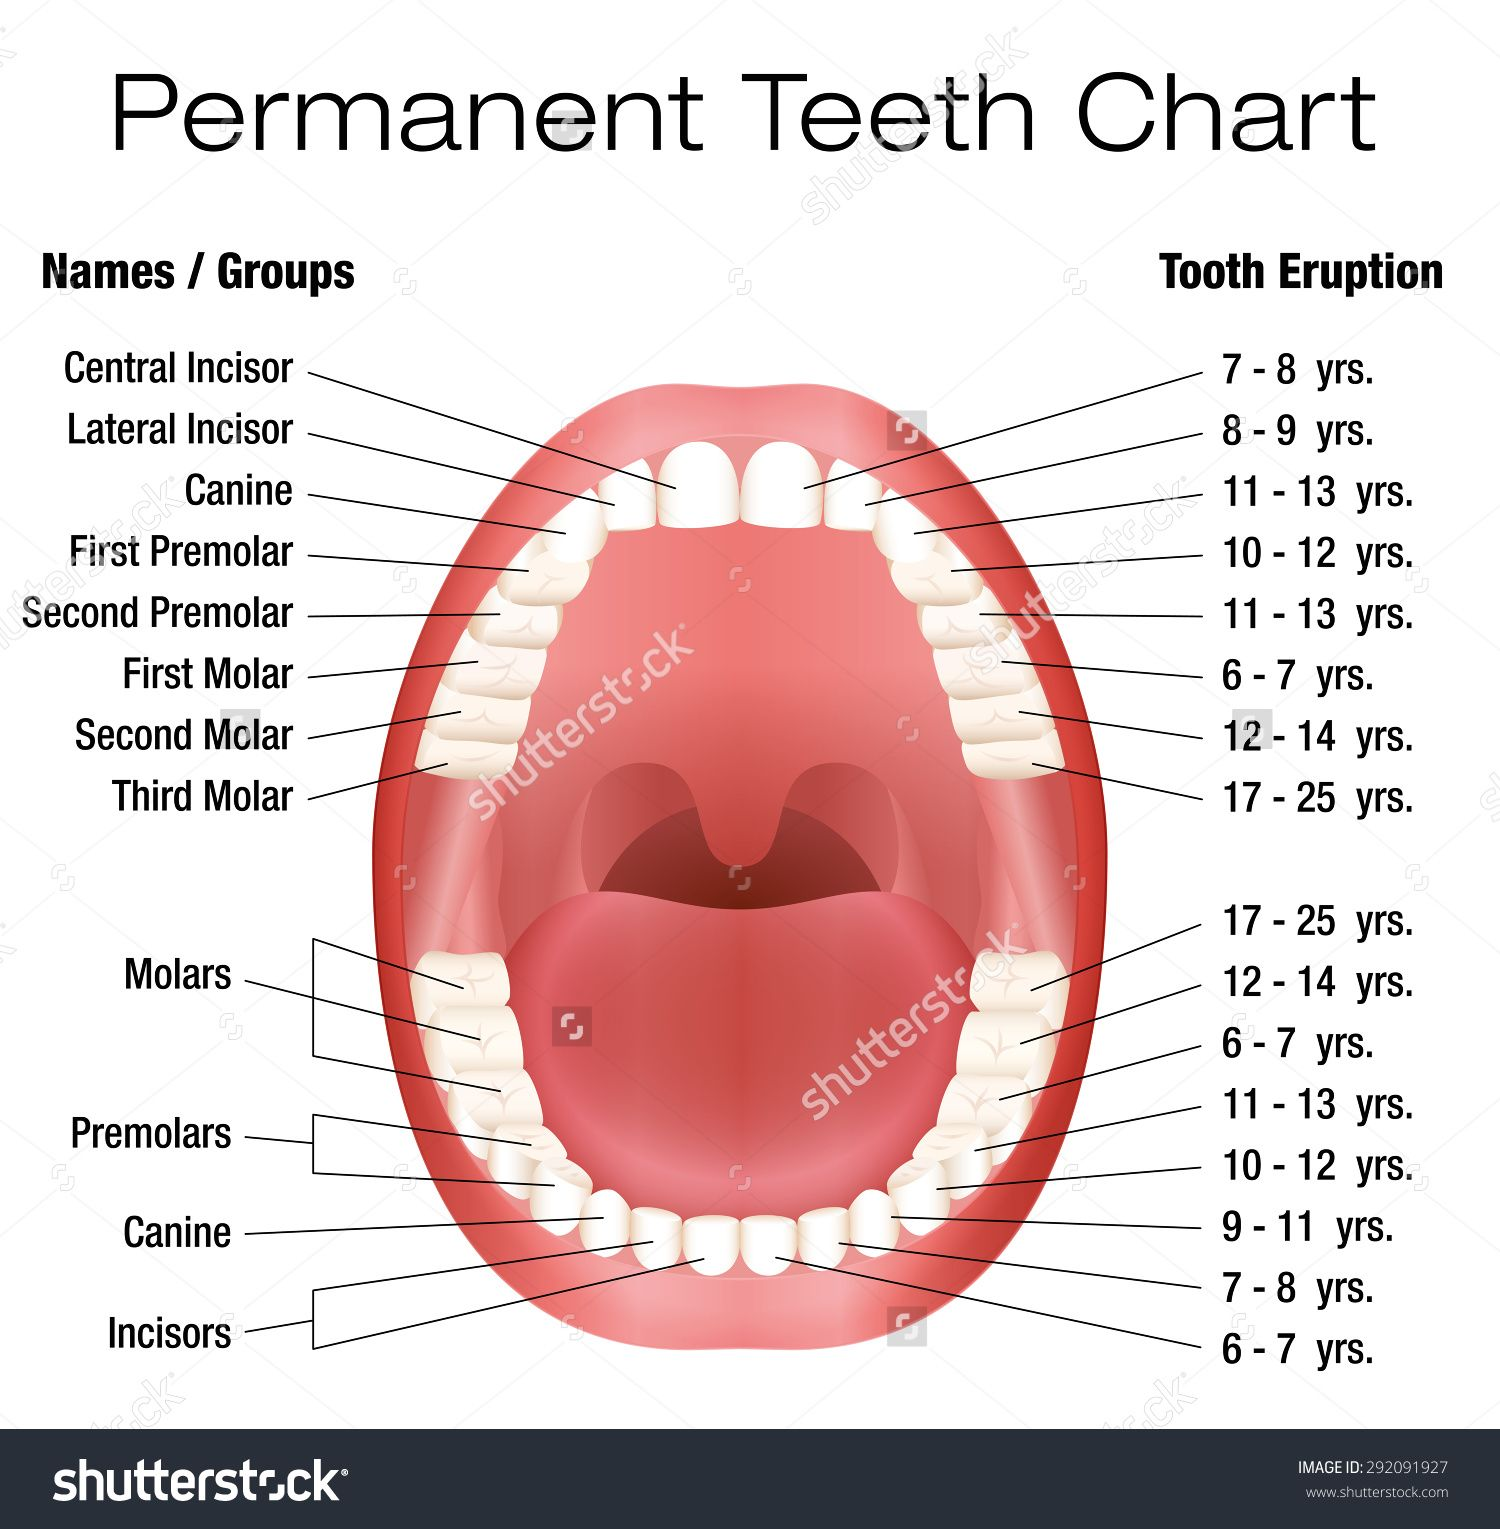 small resolution of teeth eruption chart teeth images human teeth body organs tooth diagram